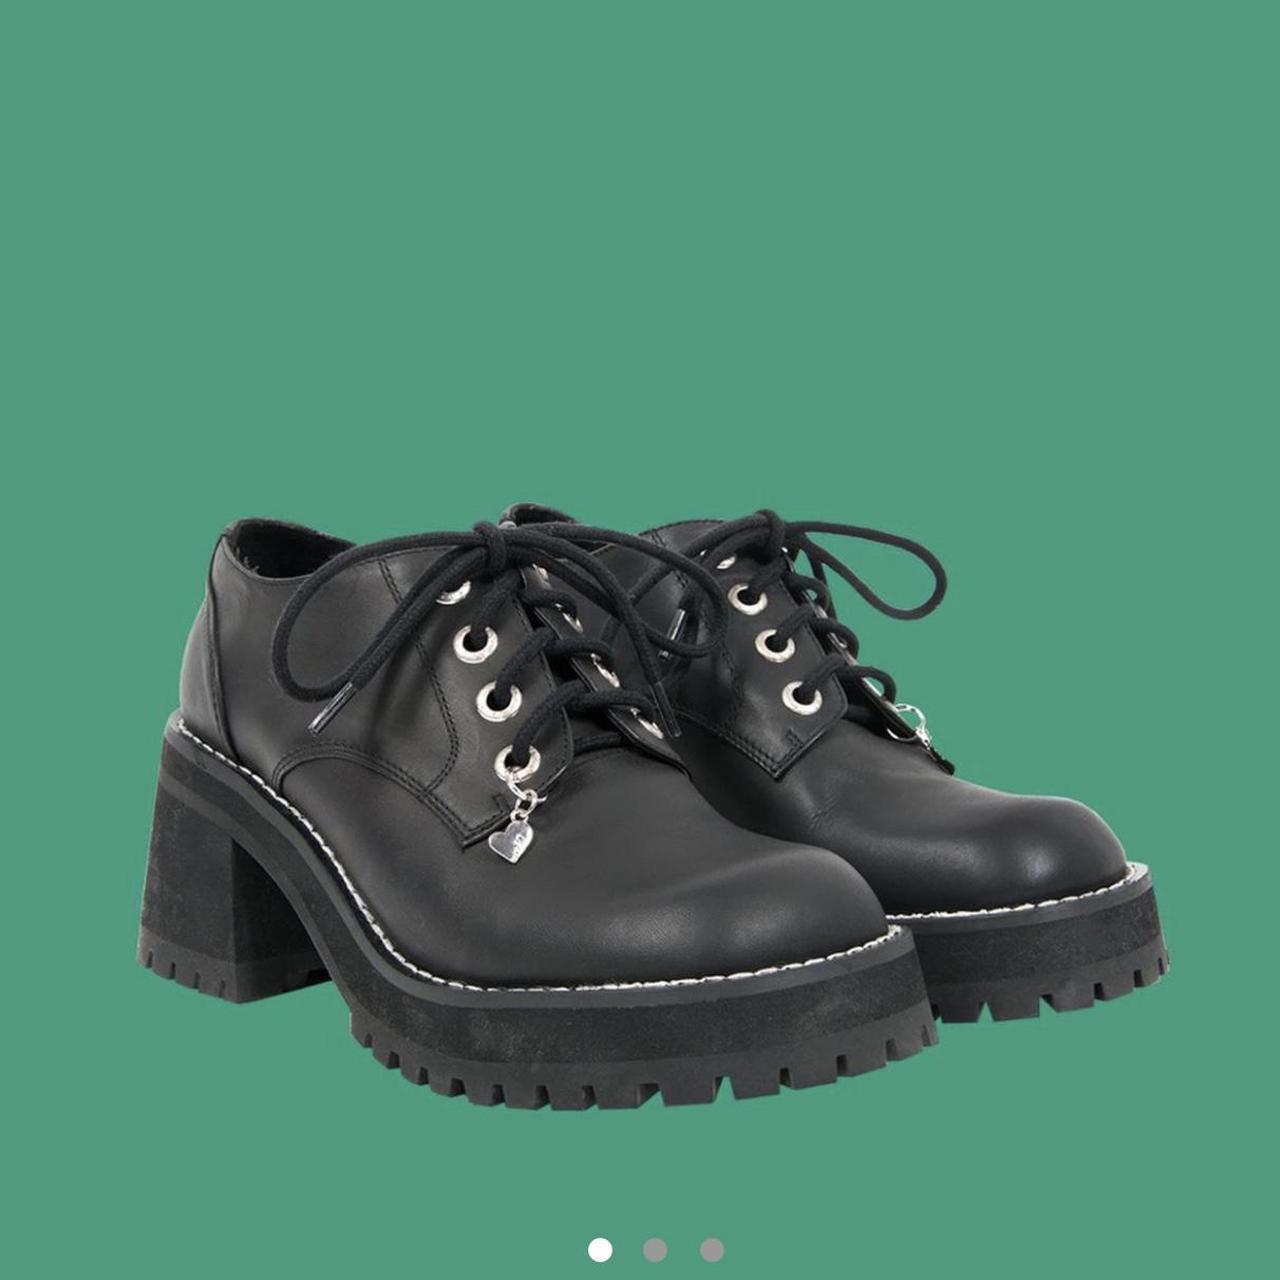 Product Image 1 - unif jane boot   - minor